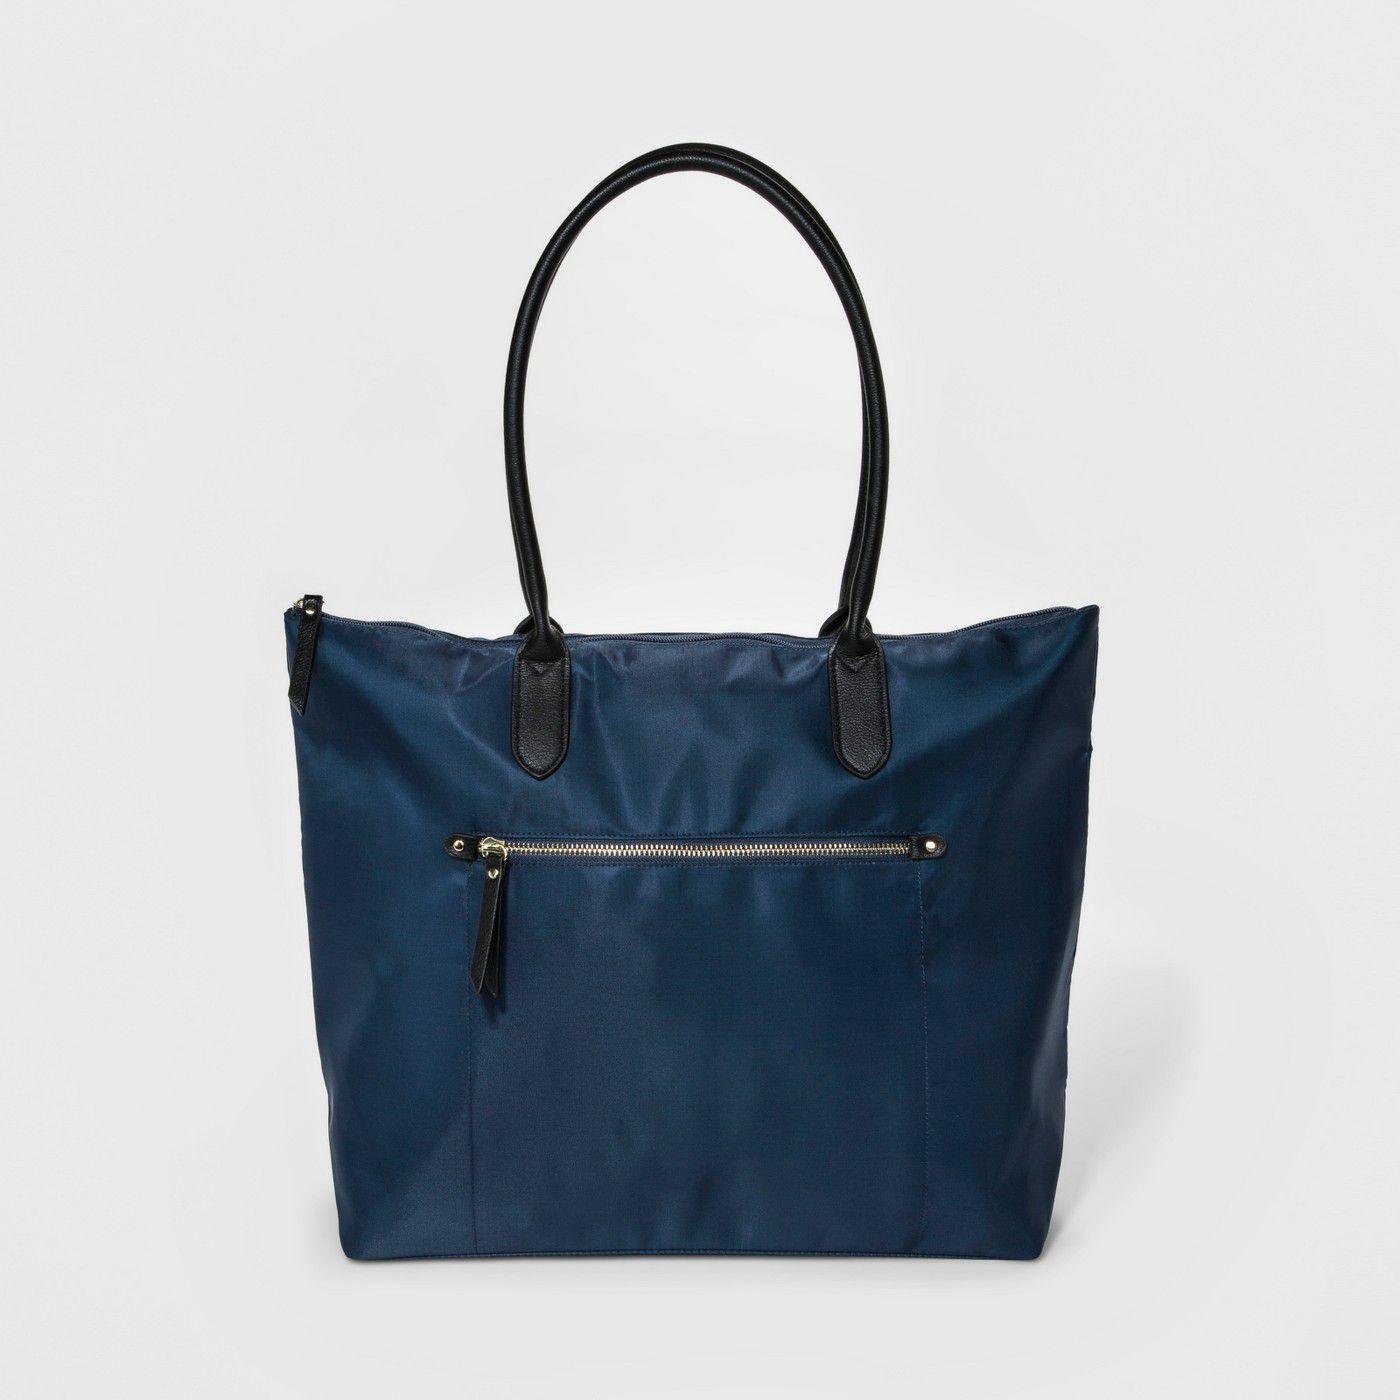 69c669943c9 The 8 Best Nylon Tote Bags of 2019